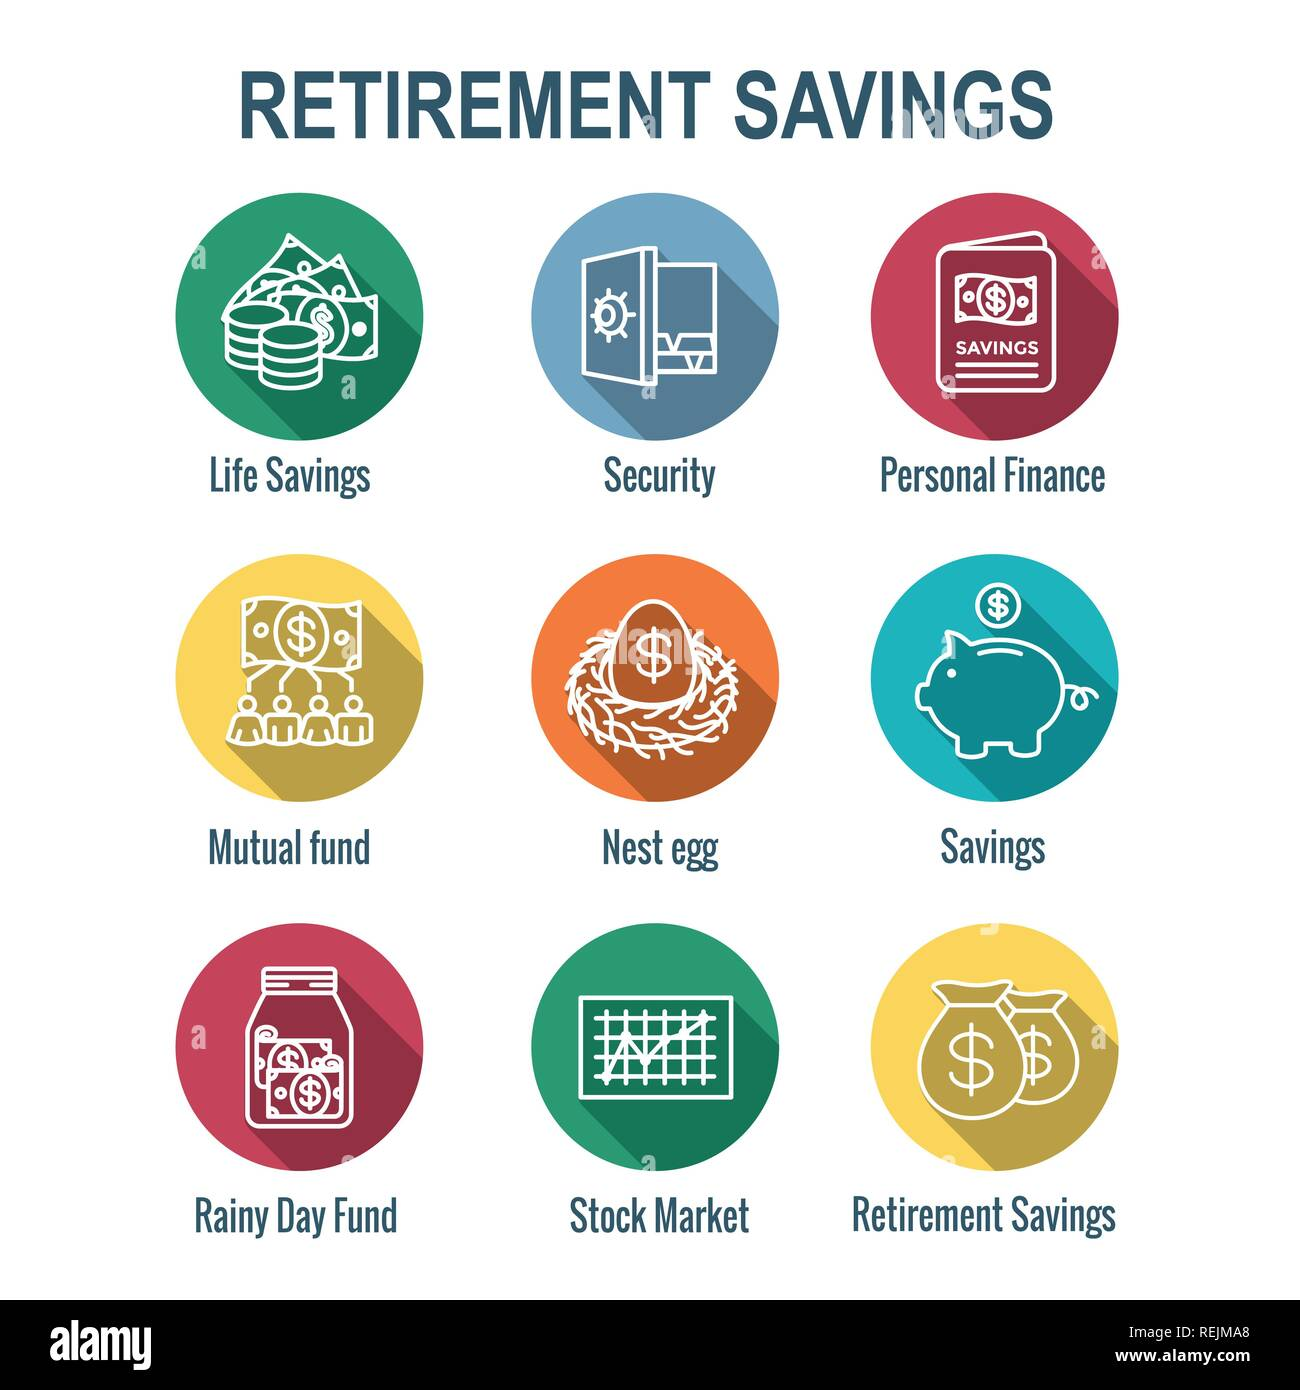 Retirement Account & Savings Icon Set - Mutual Fund, Roth IRA, etc Stock Vector